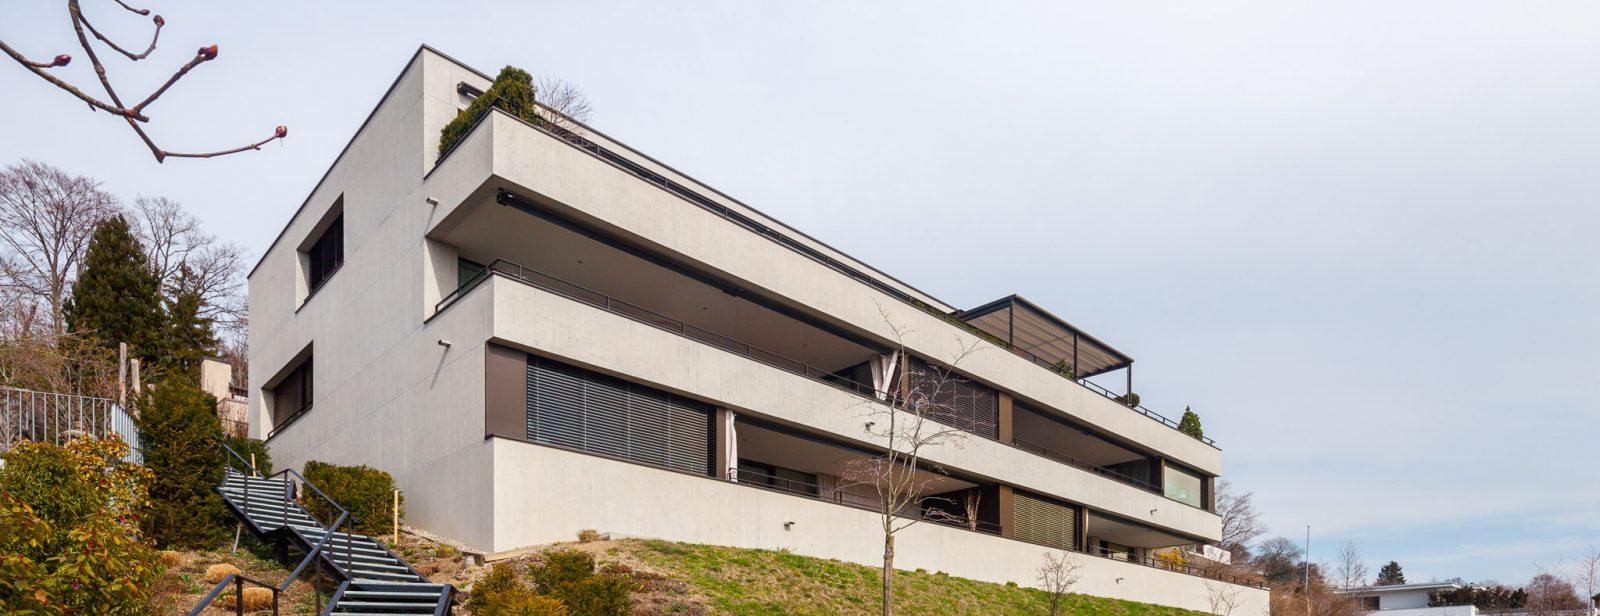 Neubau 2 MFH Kluserweg 6, 8706 Meilen